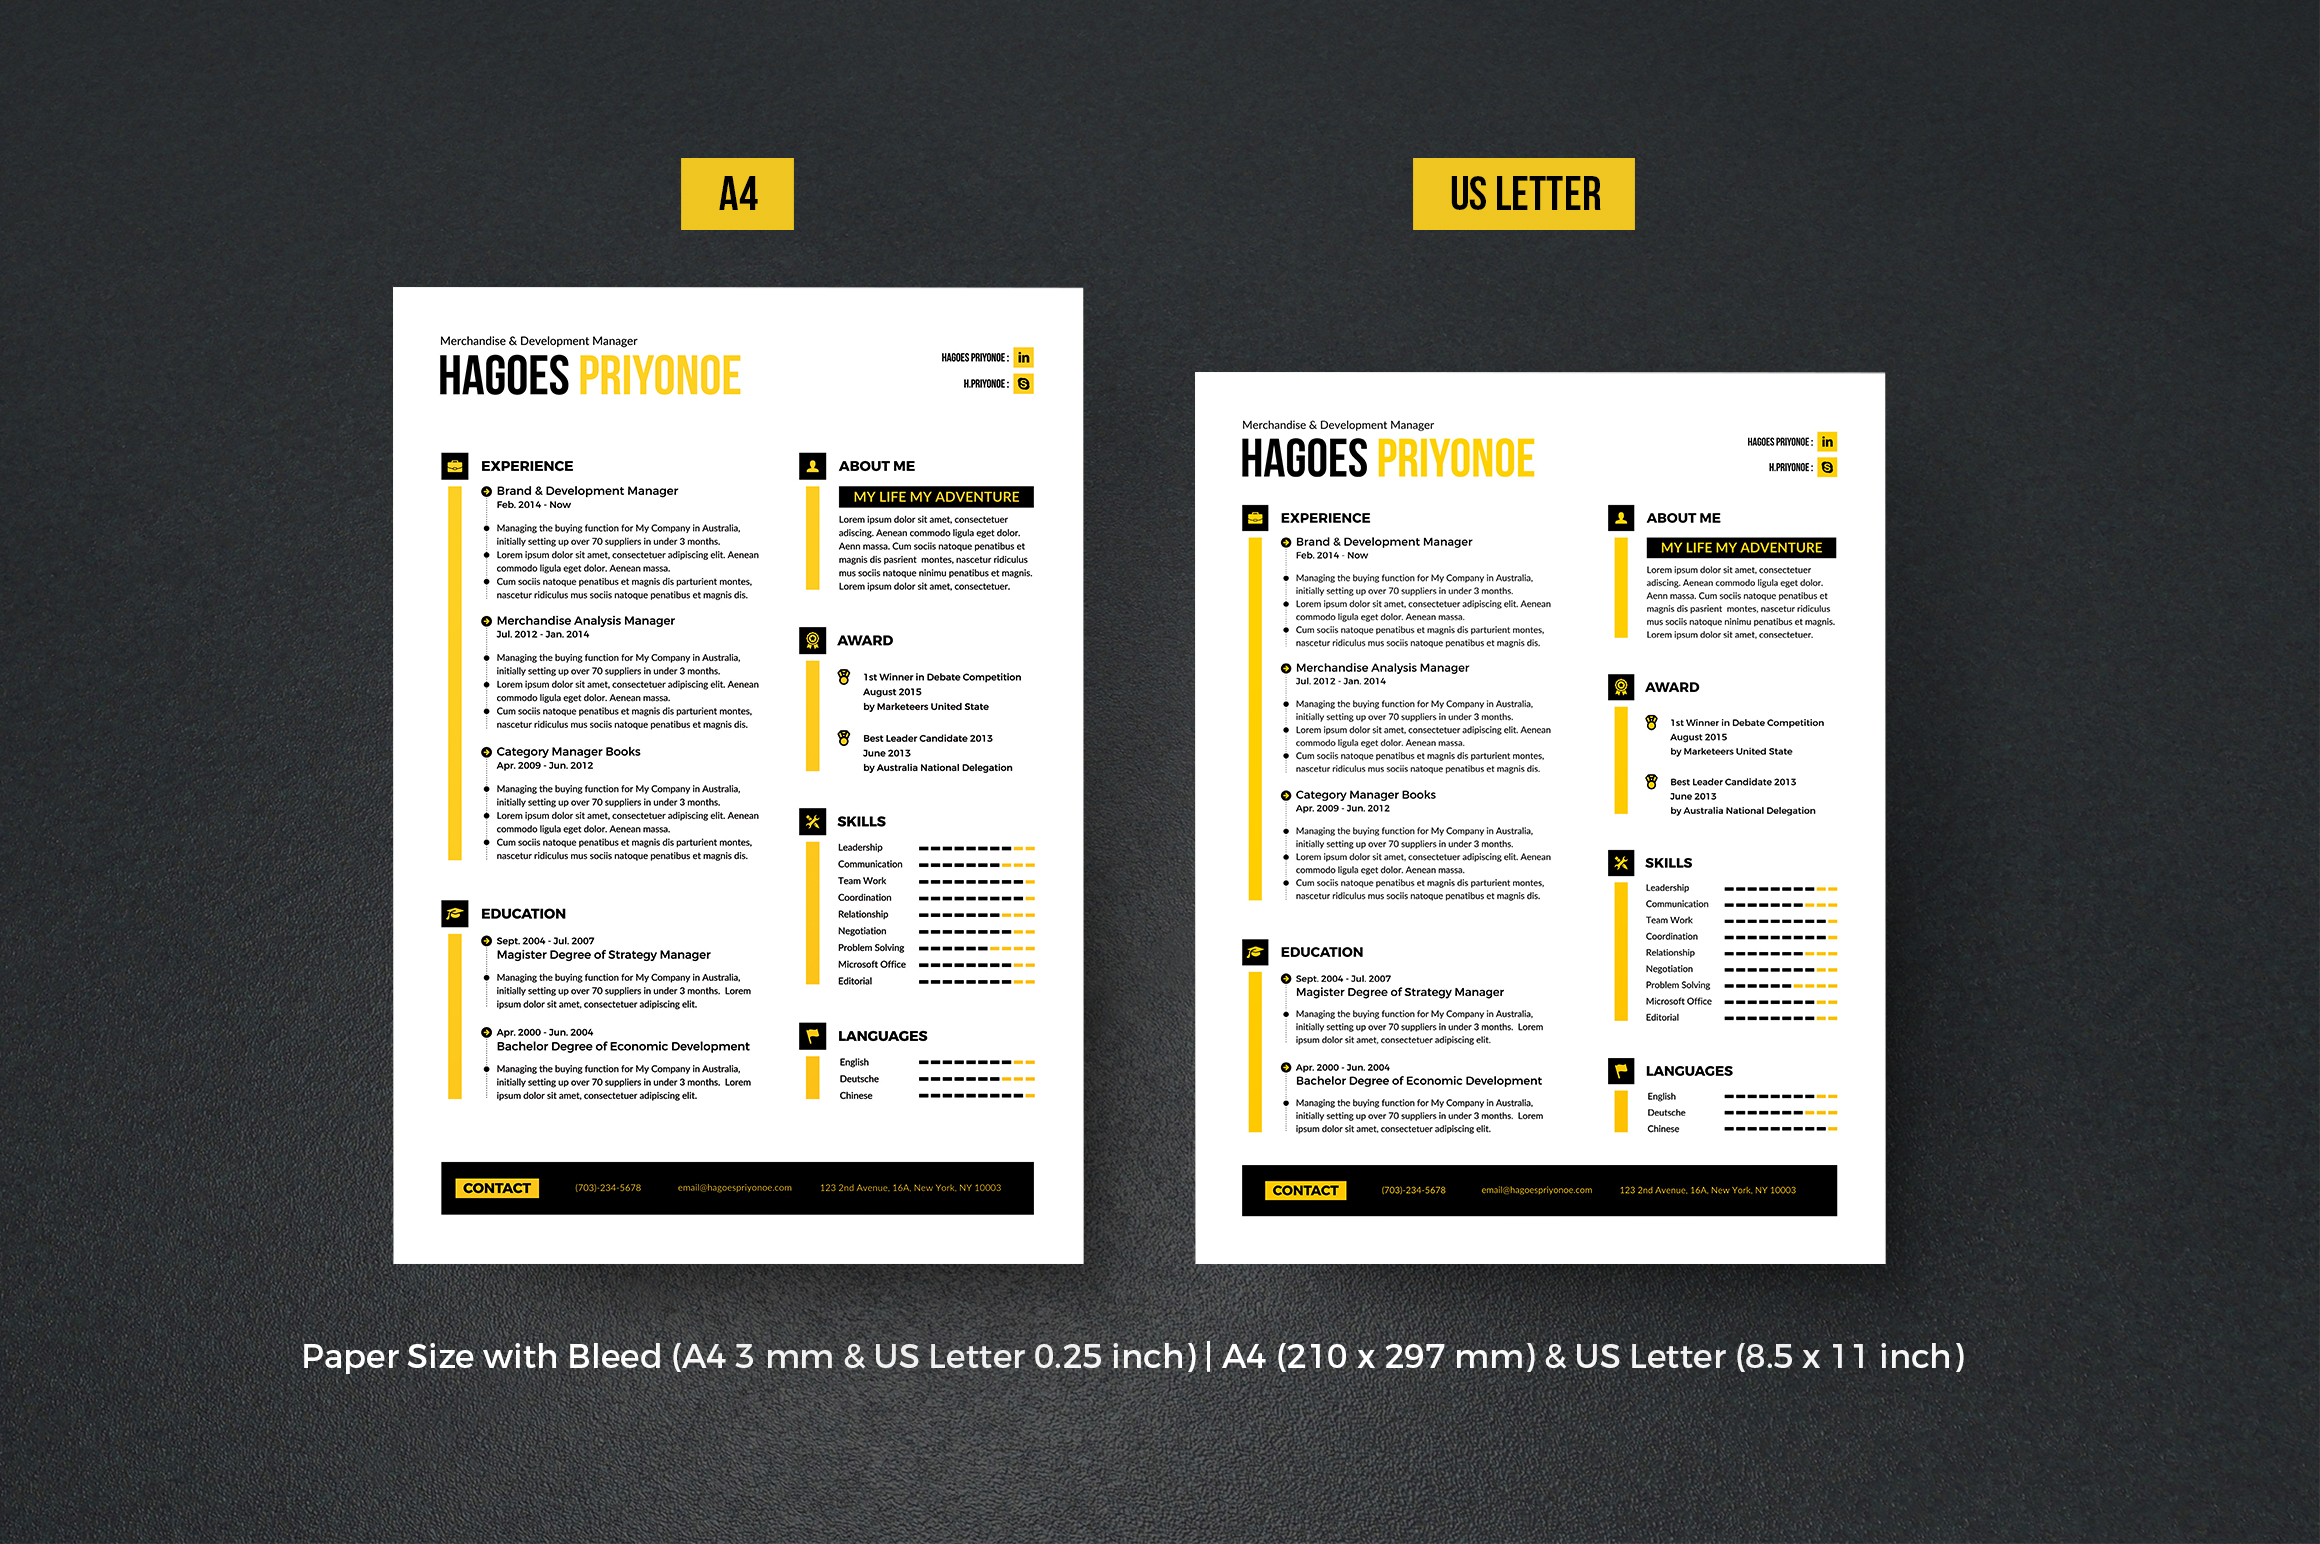 Resume example image 4